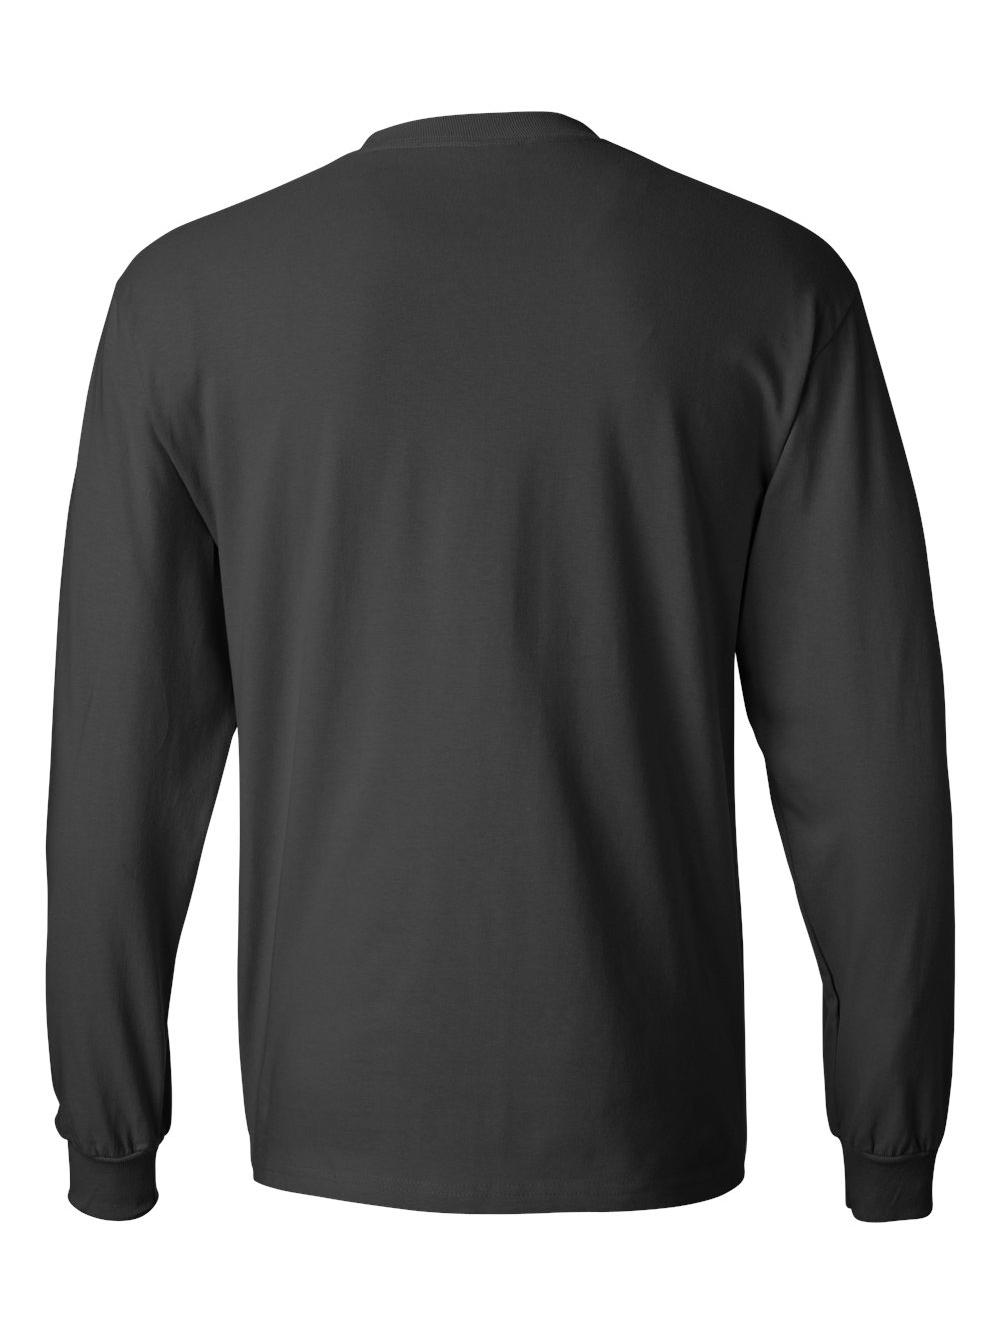 Hanes-Beefy-T-Long-Sleeve-T-Shirt-5186 thumbnail 49